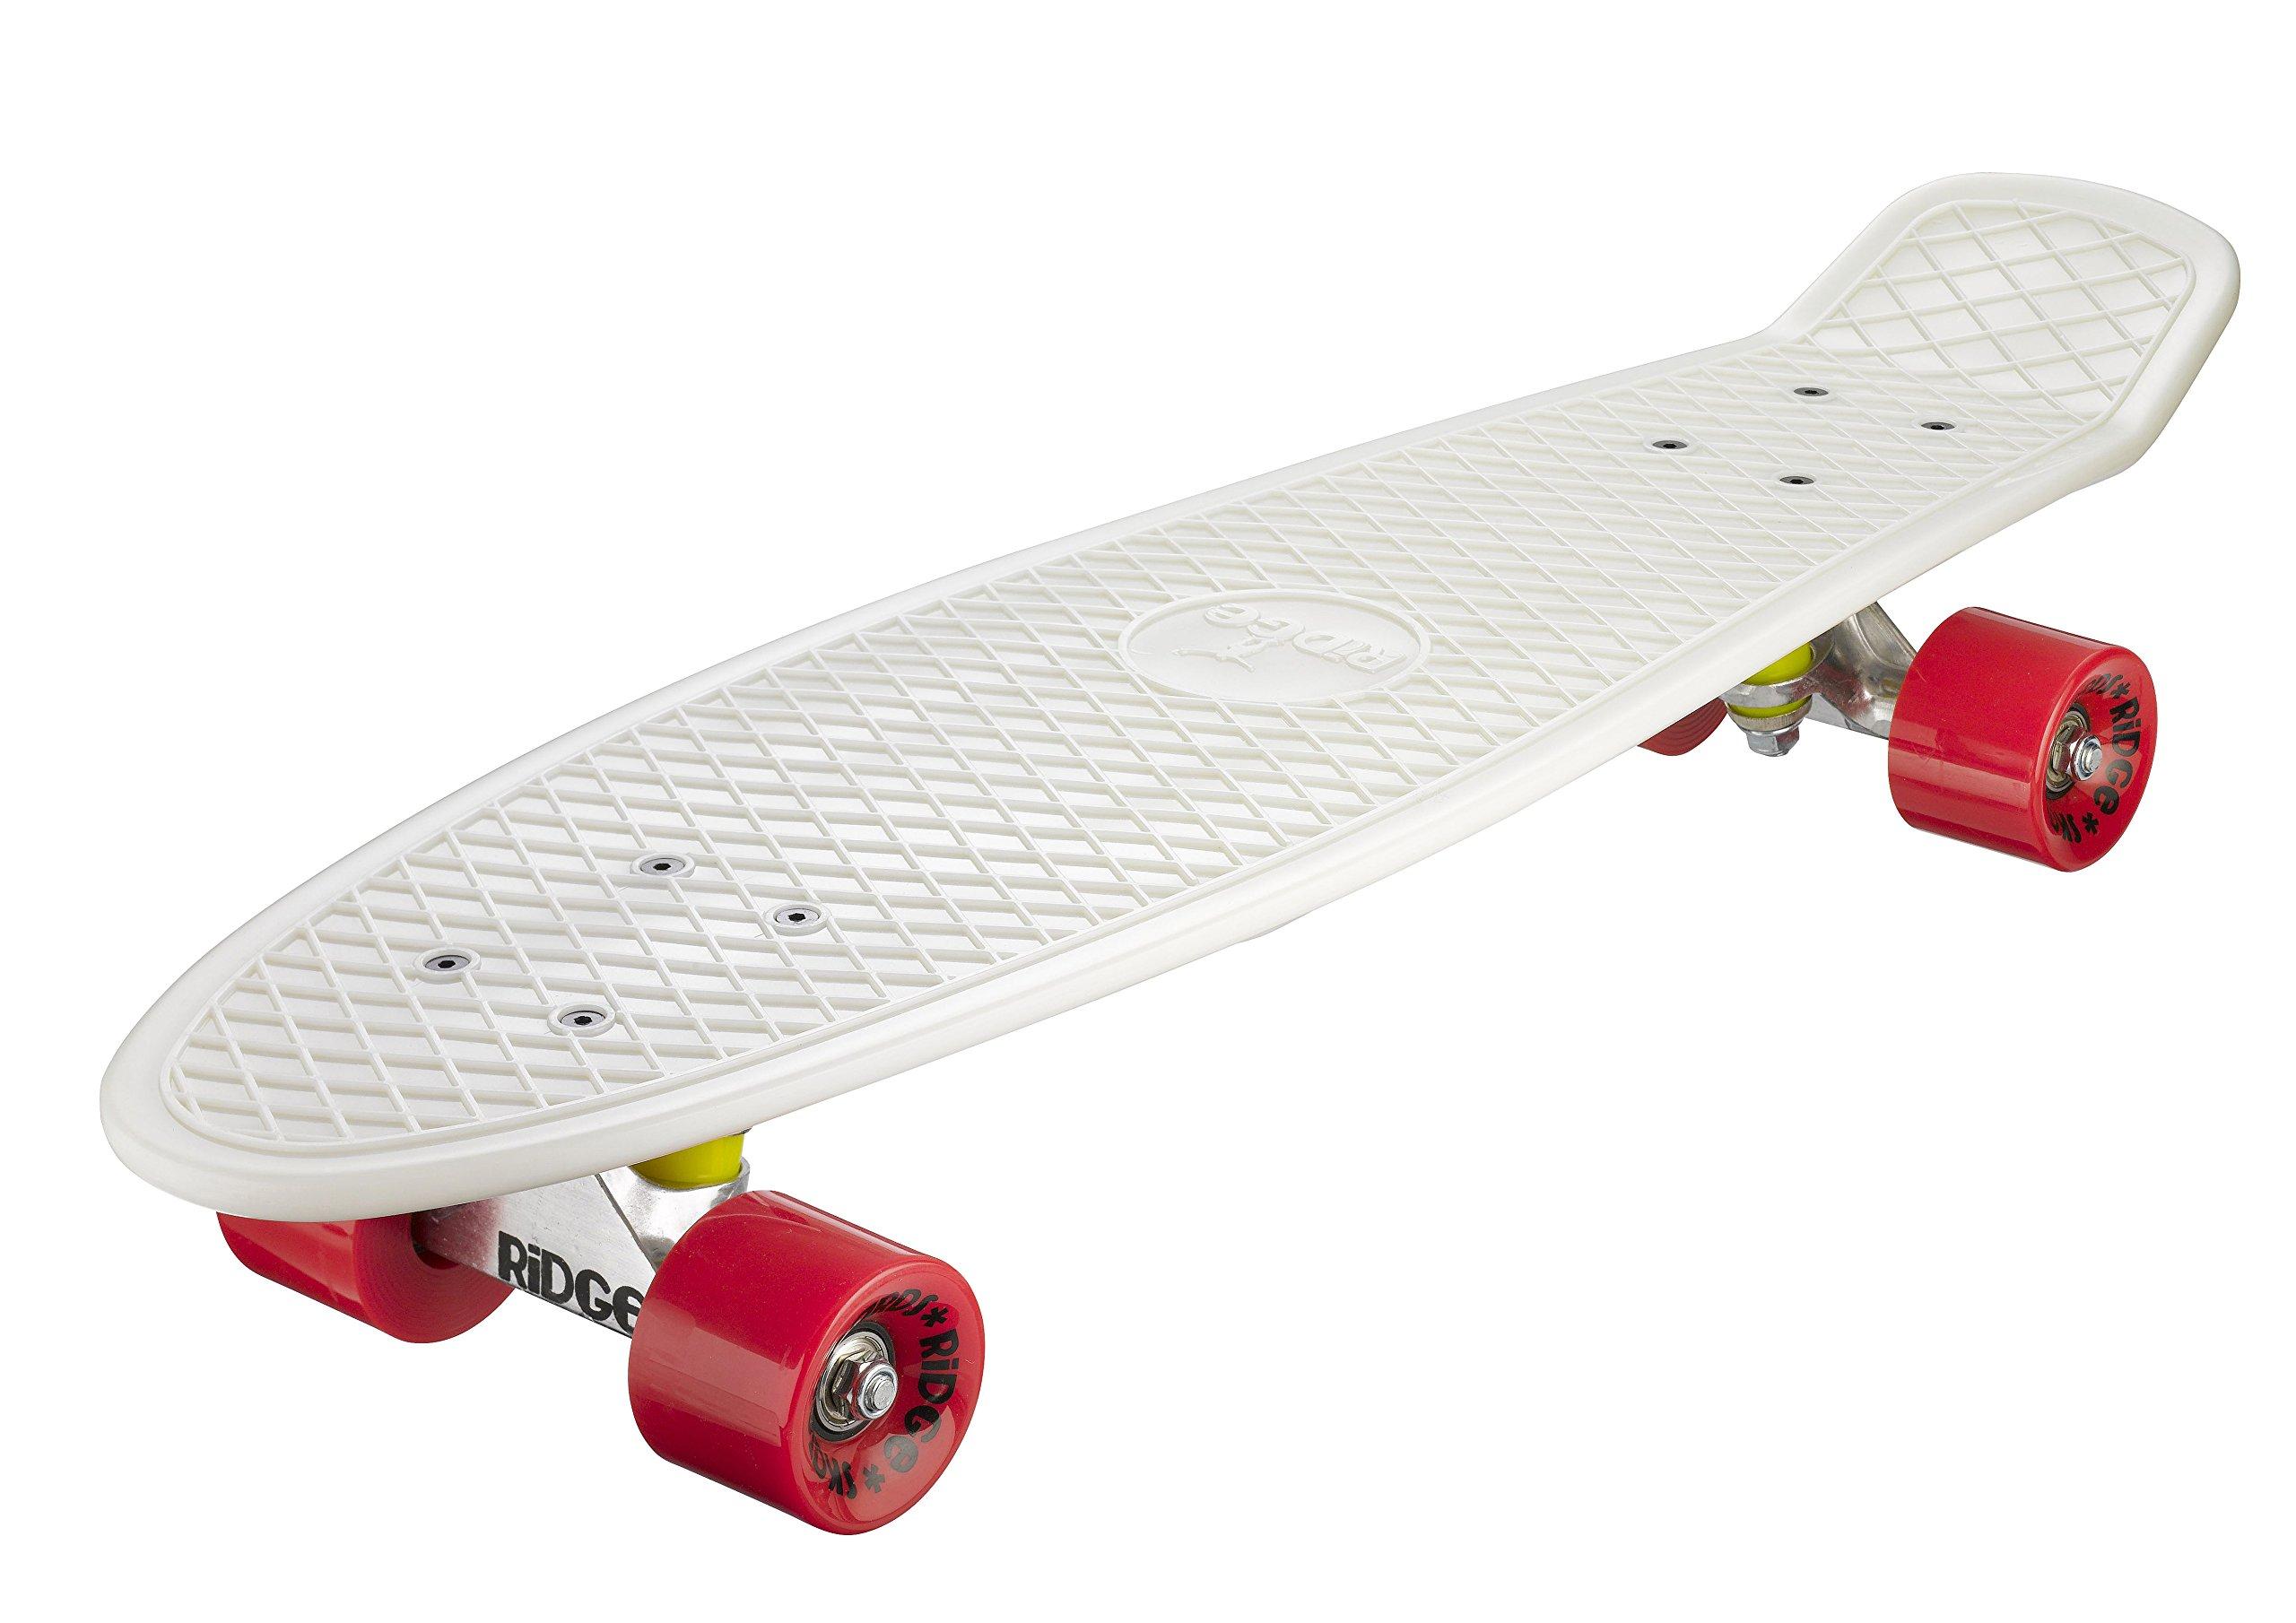 Ridge Skateboards Glow in Dark Big Brother Cruiser Skateboard - Red, 27-Inch